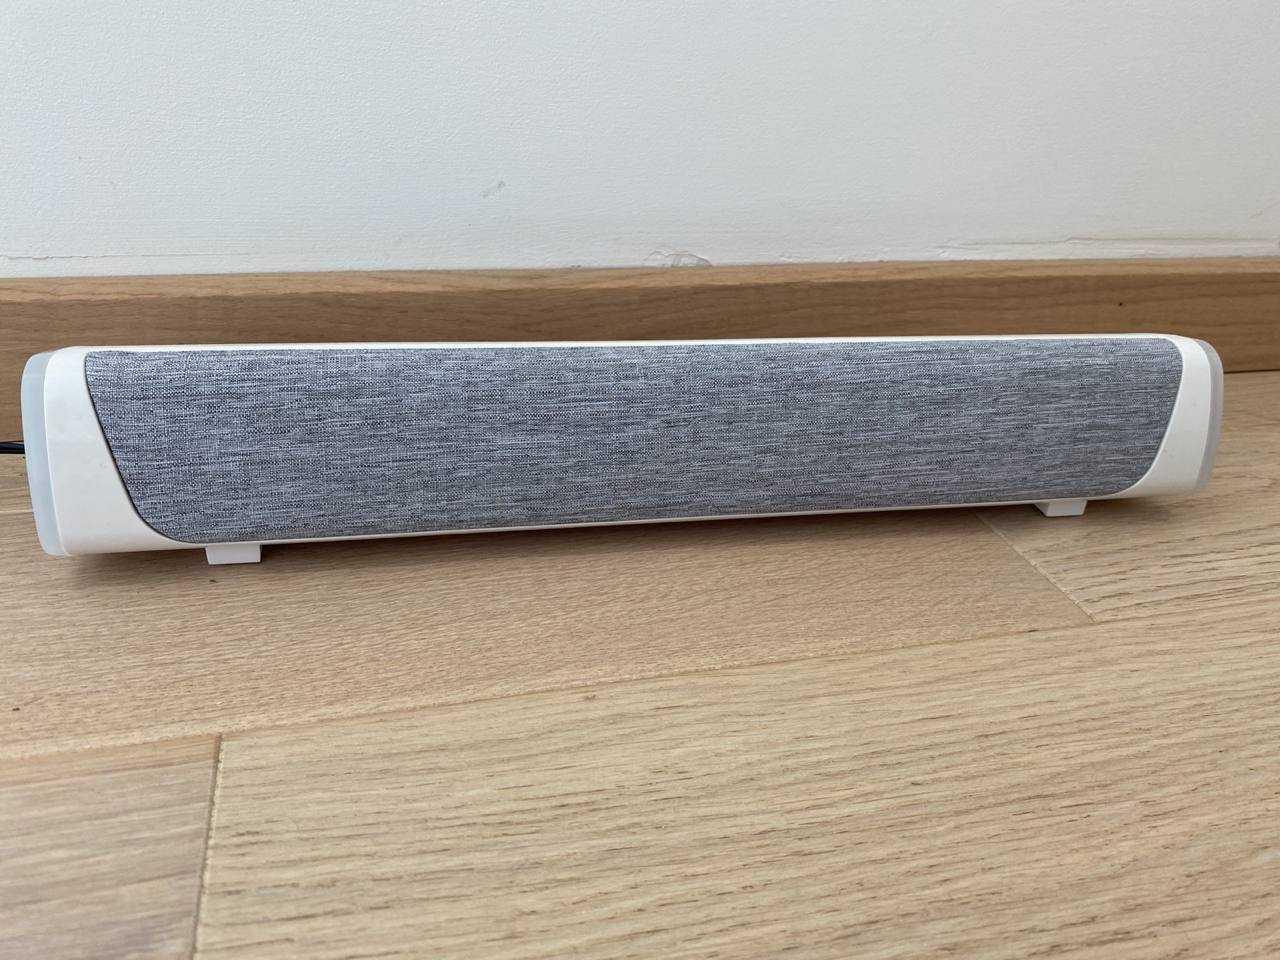 Recensione Desktop Speaker V8: sensazioni da low-budget